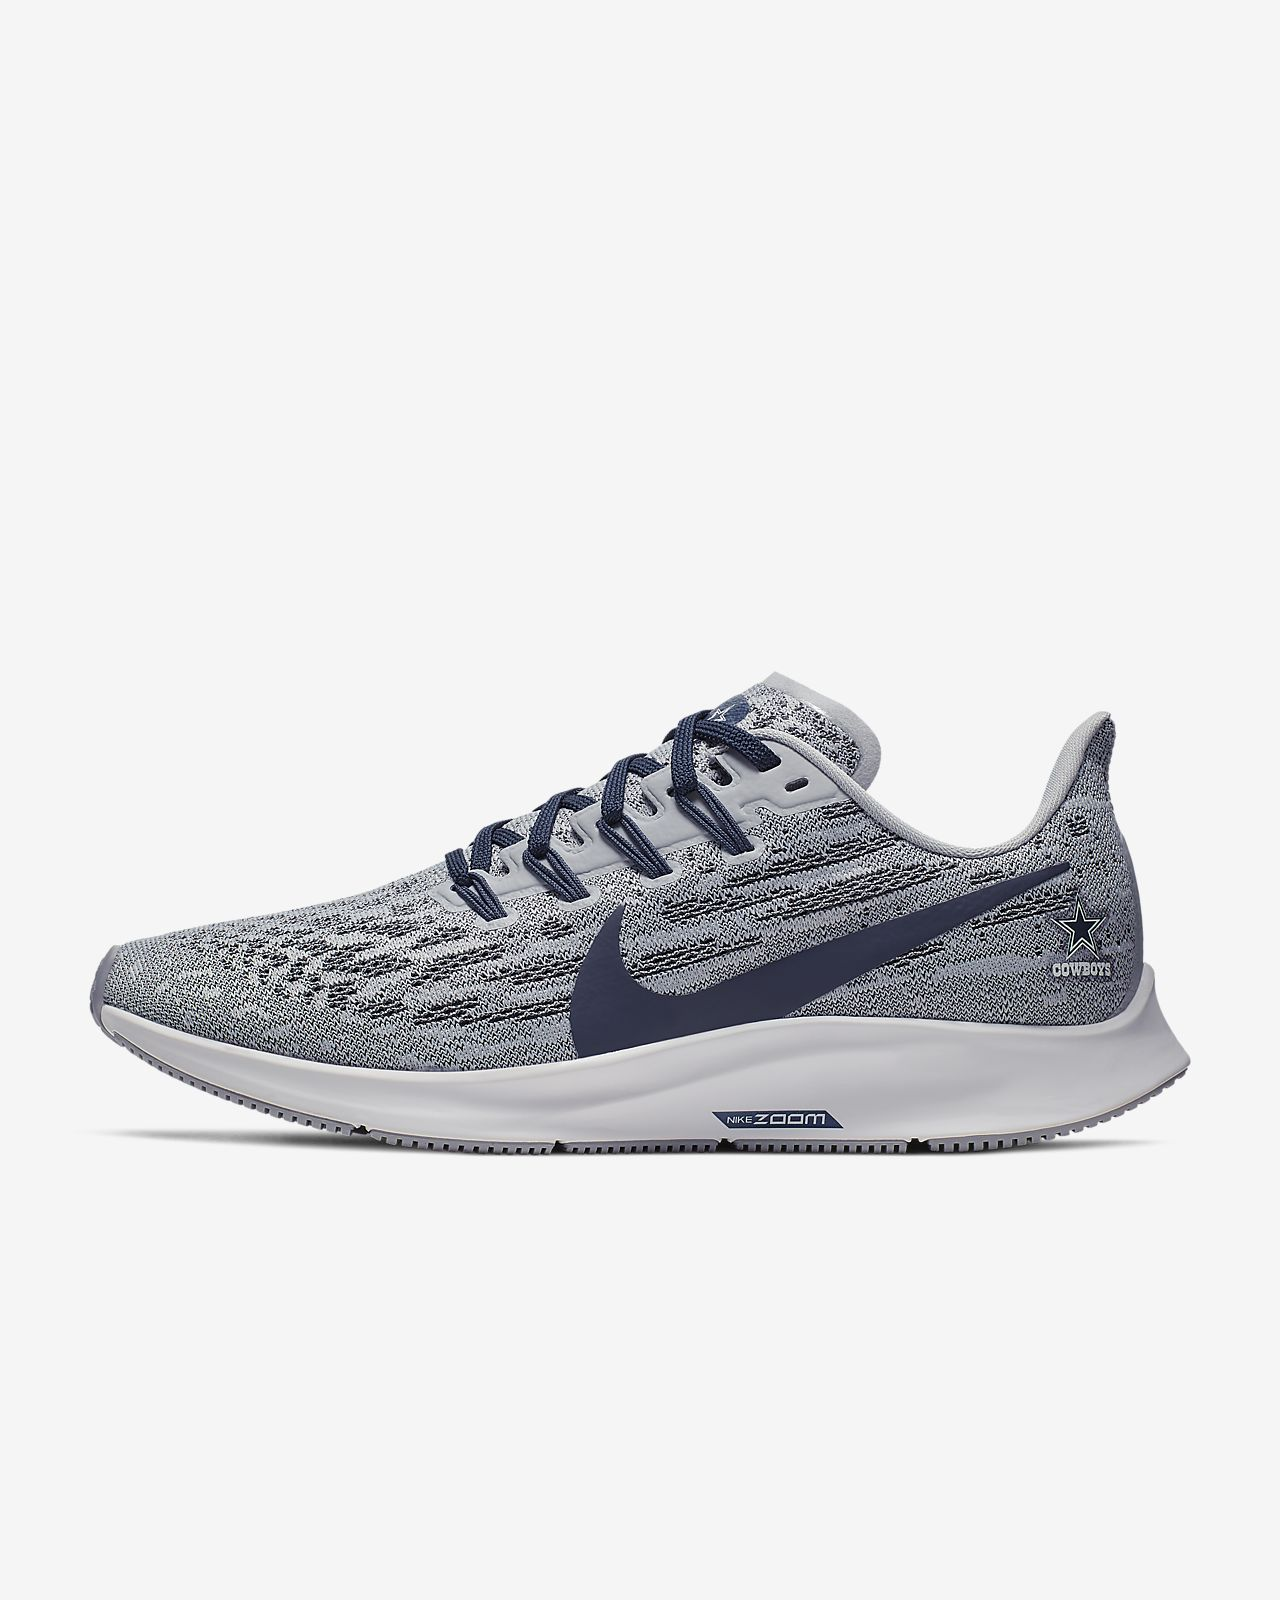 Nike Air Zoom Pegasus 36 (Cowboys) Women's Running Shoe